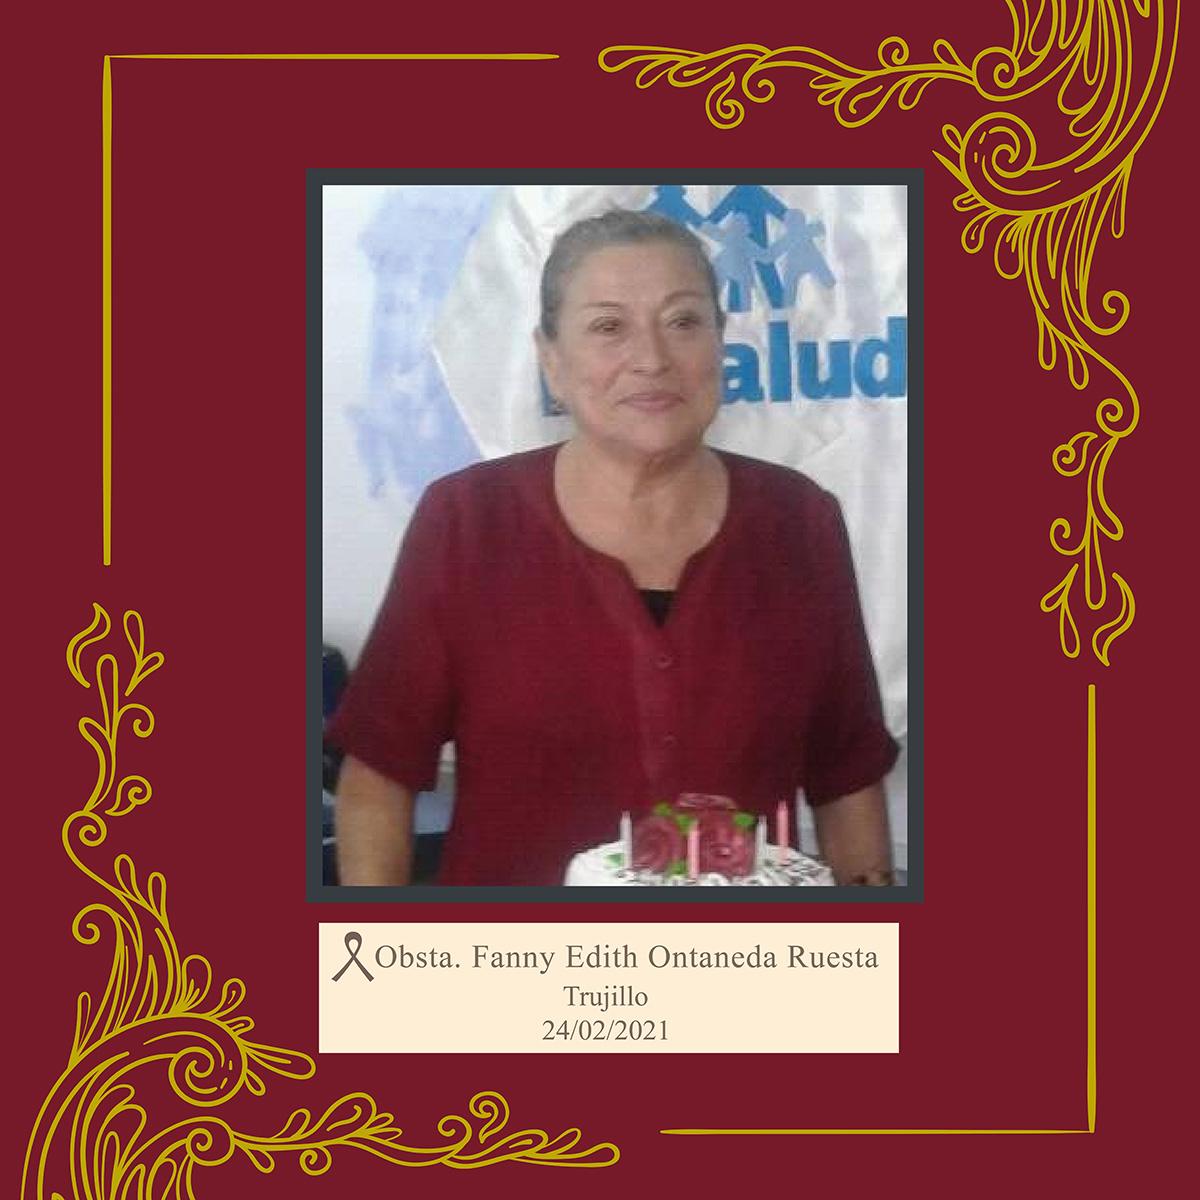 Fanny Edith Ontaneda Ruesta